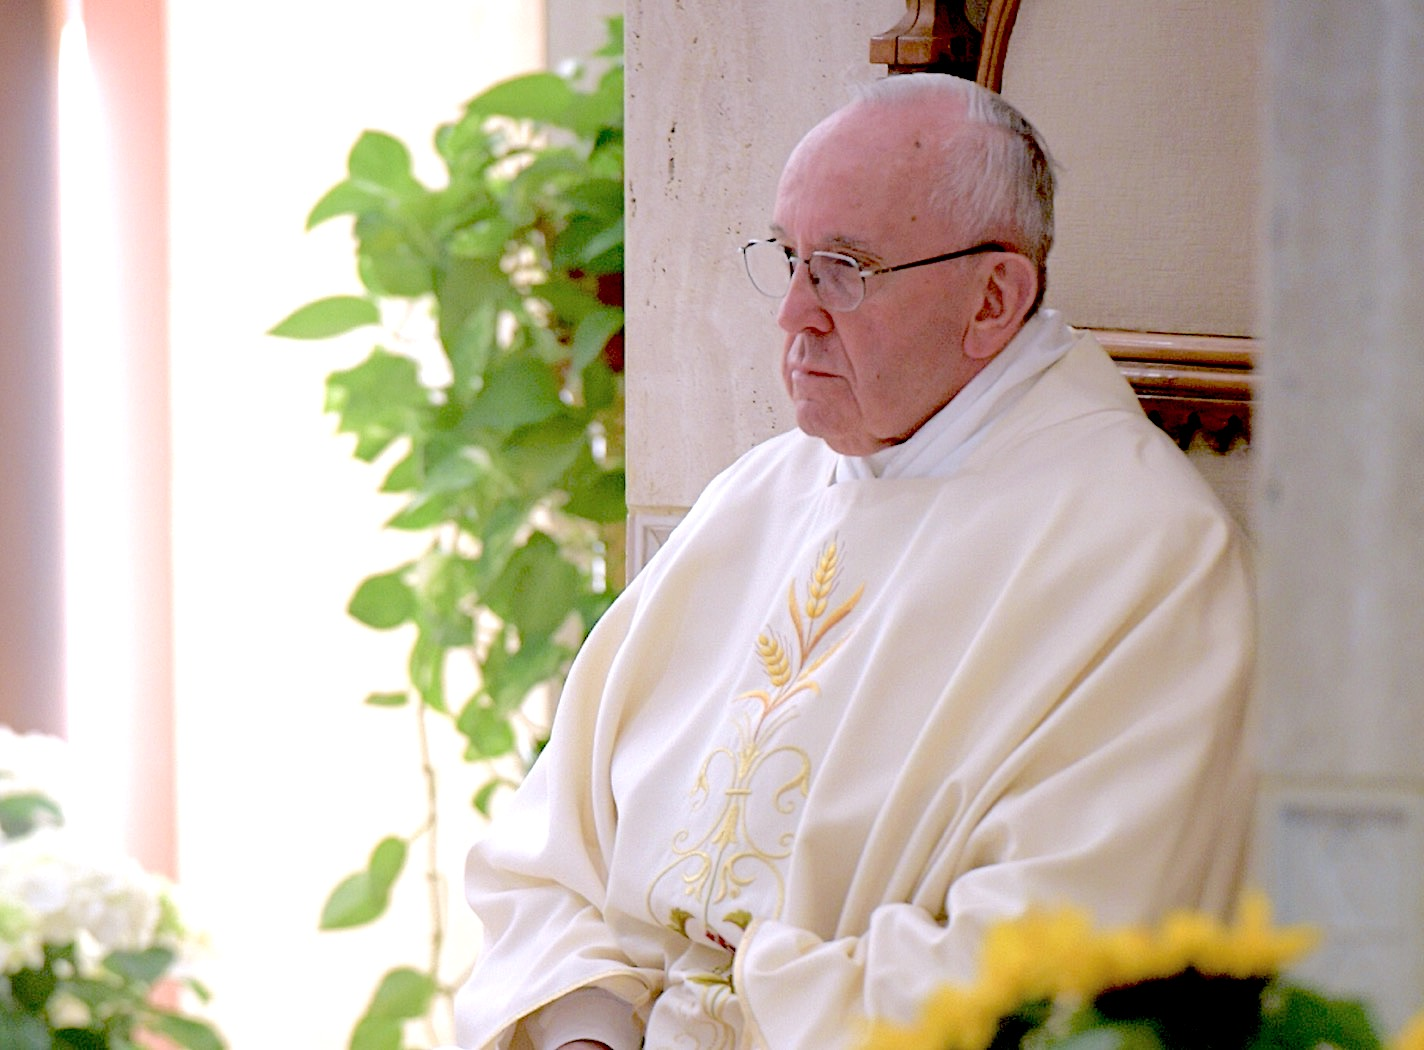 El Santo Padre en Santa Marta (Osservatore @ Romano)